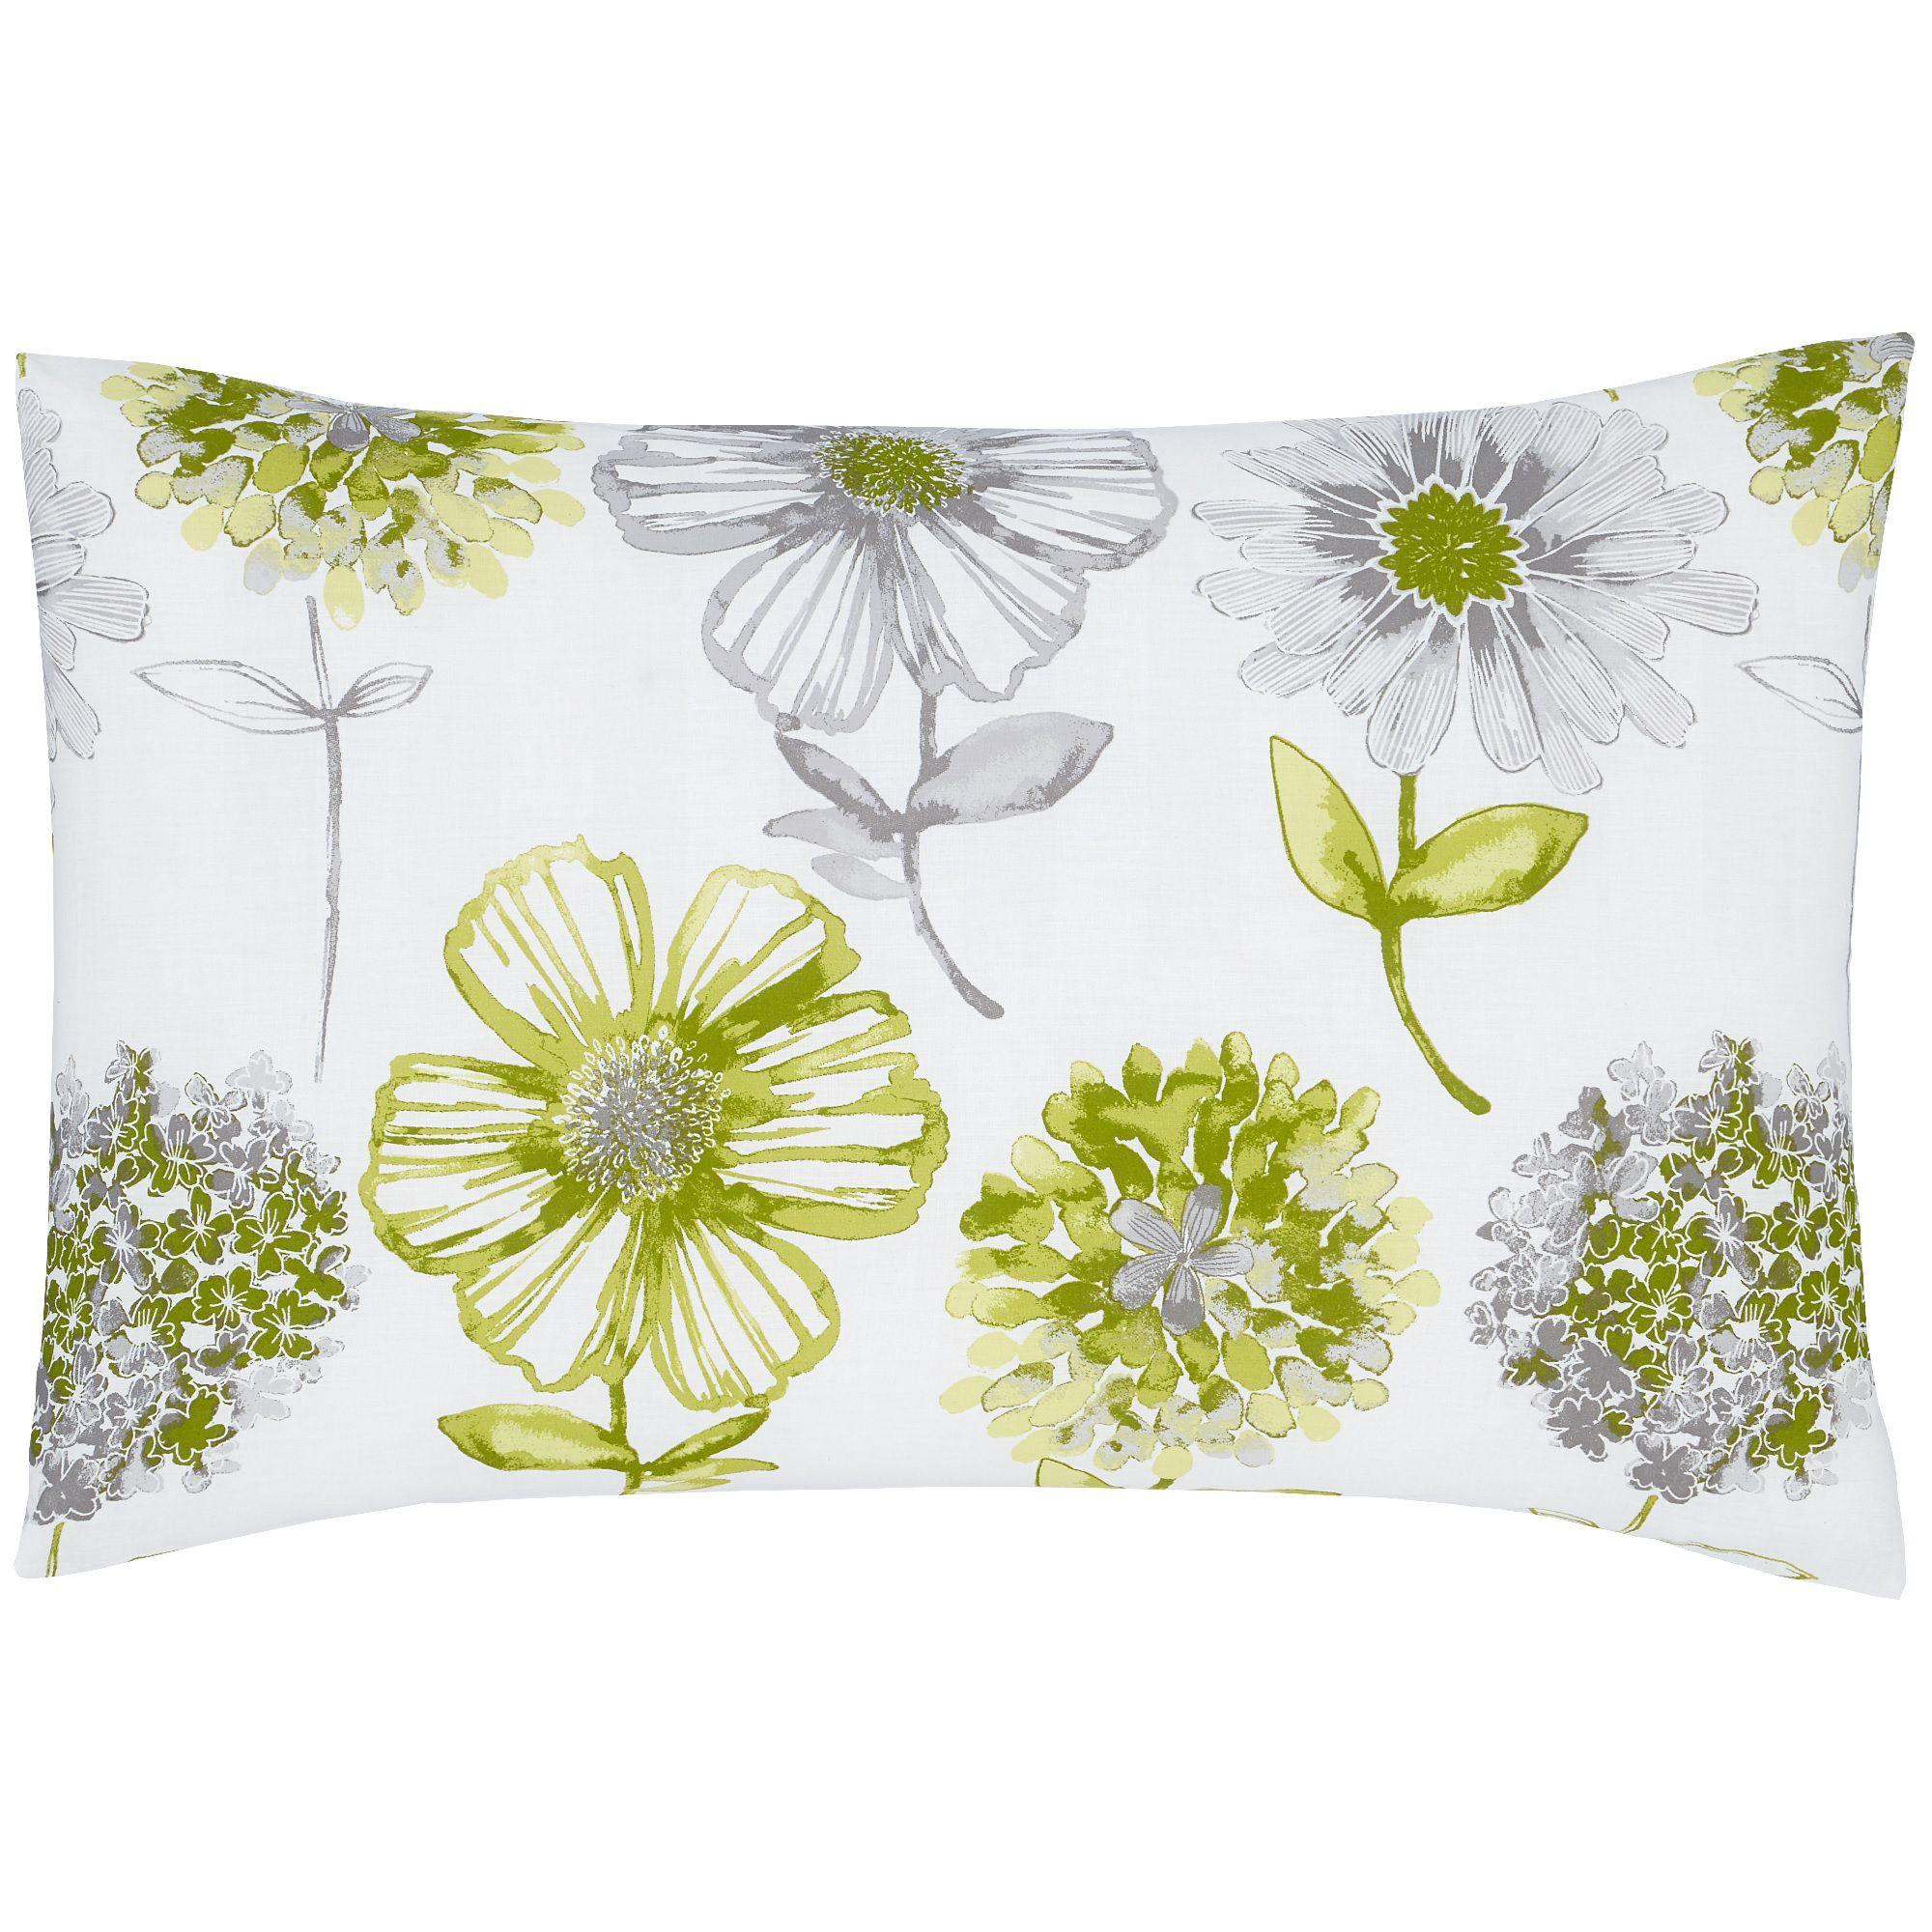 Catherine-Lansfield-Banbury-Floral-Bedding-Duvet-Set-Bedspread-Yellow-Green thumbnail 11